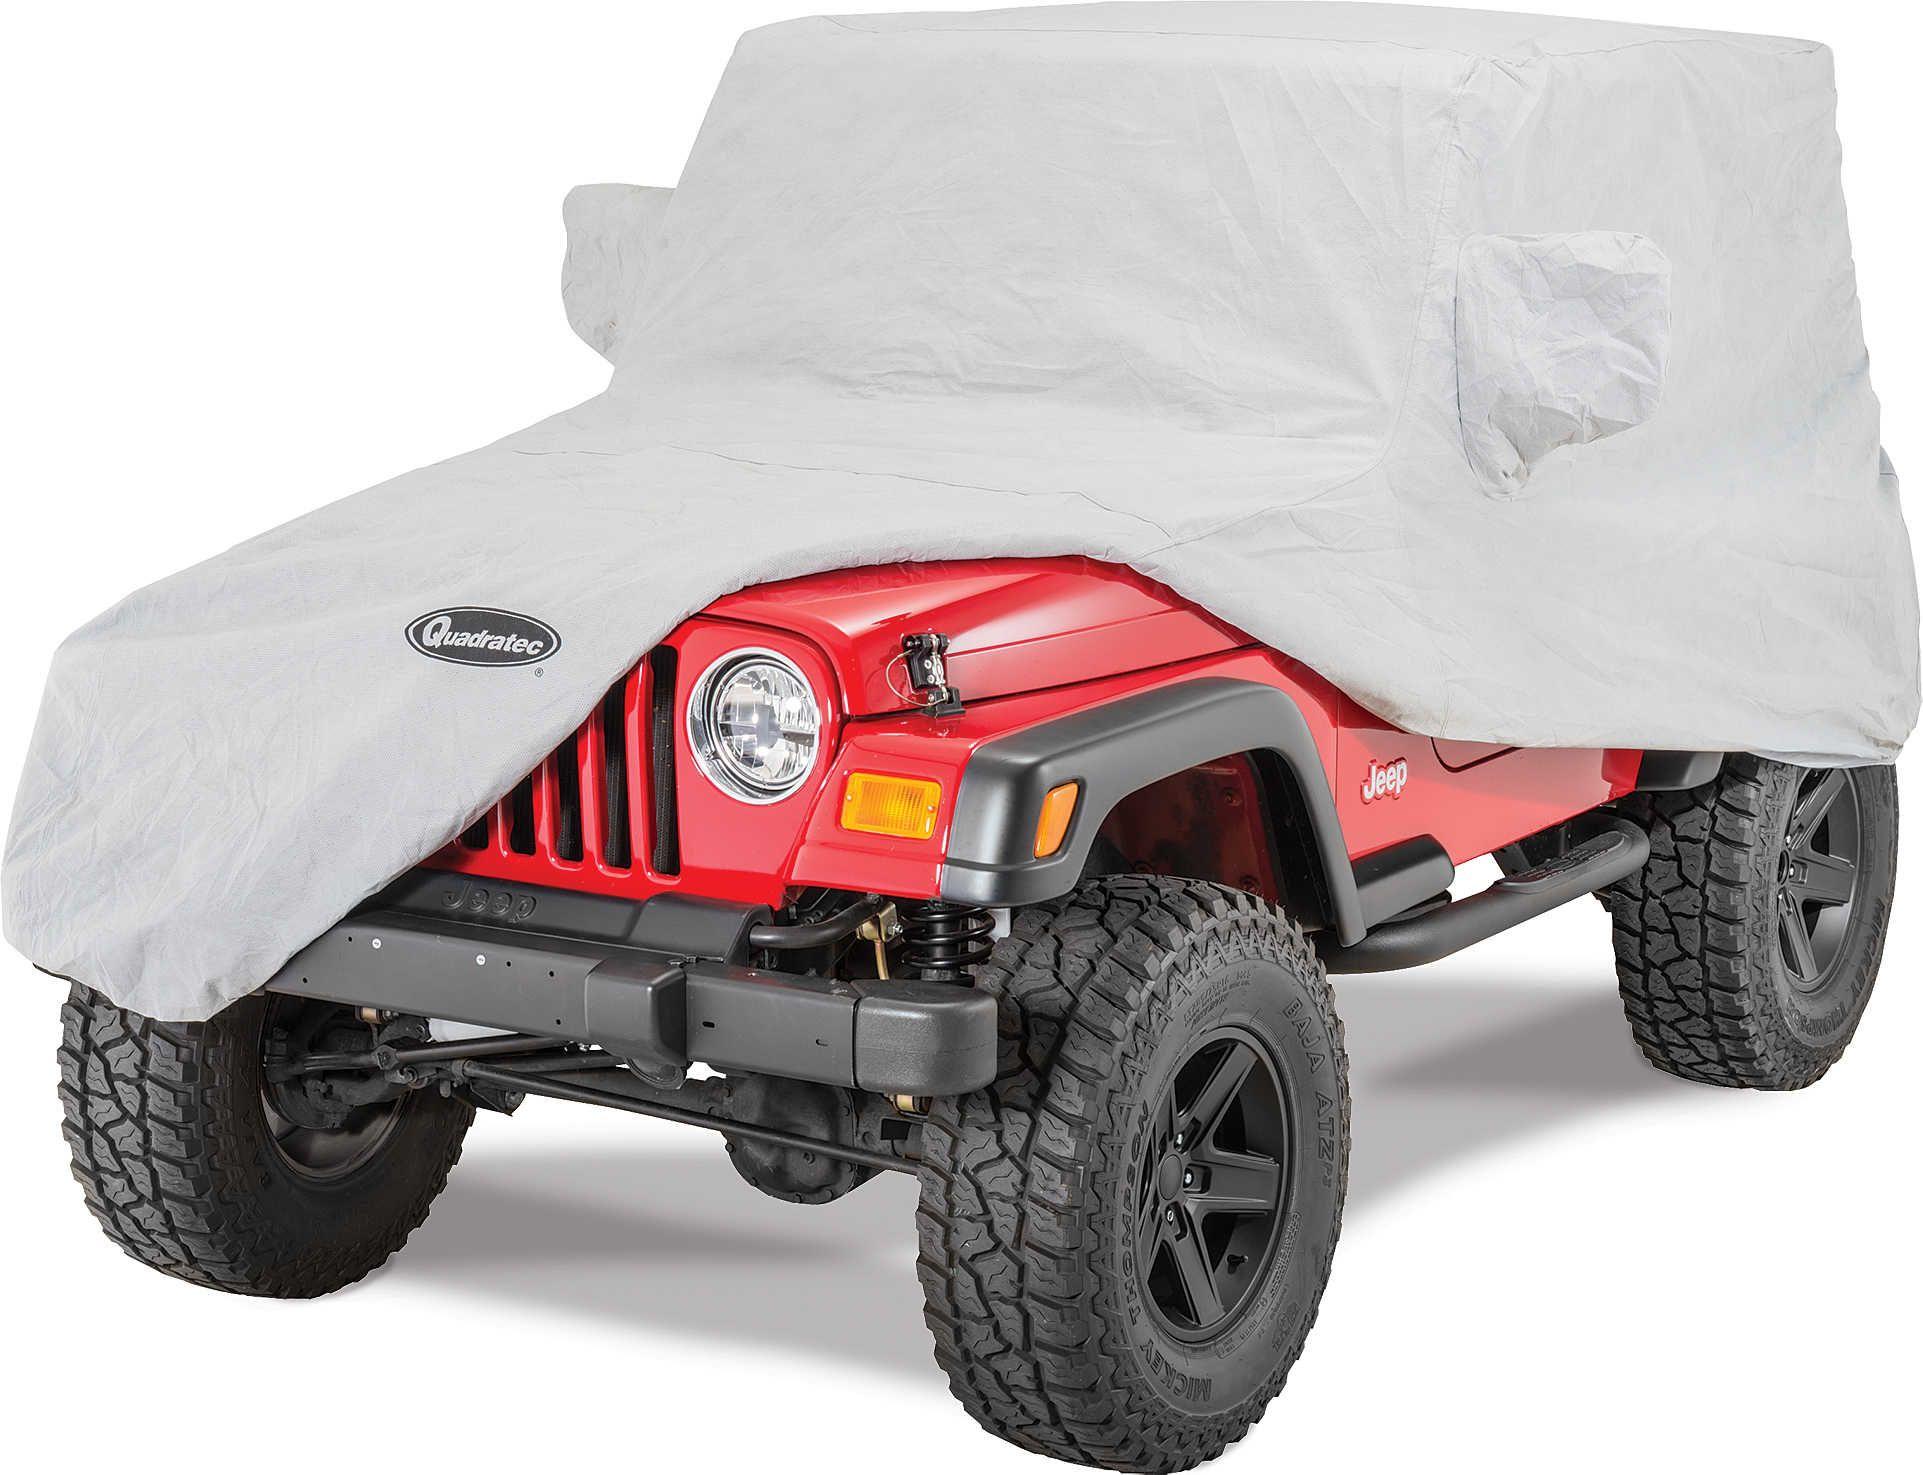 Softbond 5 Layer Car Cover For 76 06 Jeep Cj 7 Wrangler Yj Tj